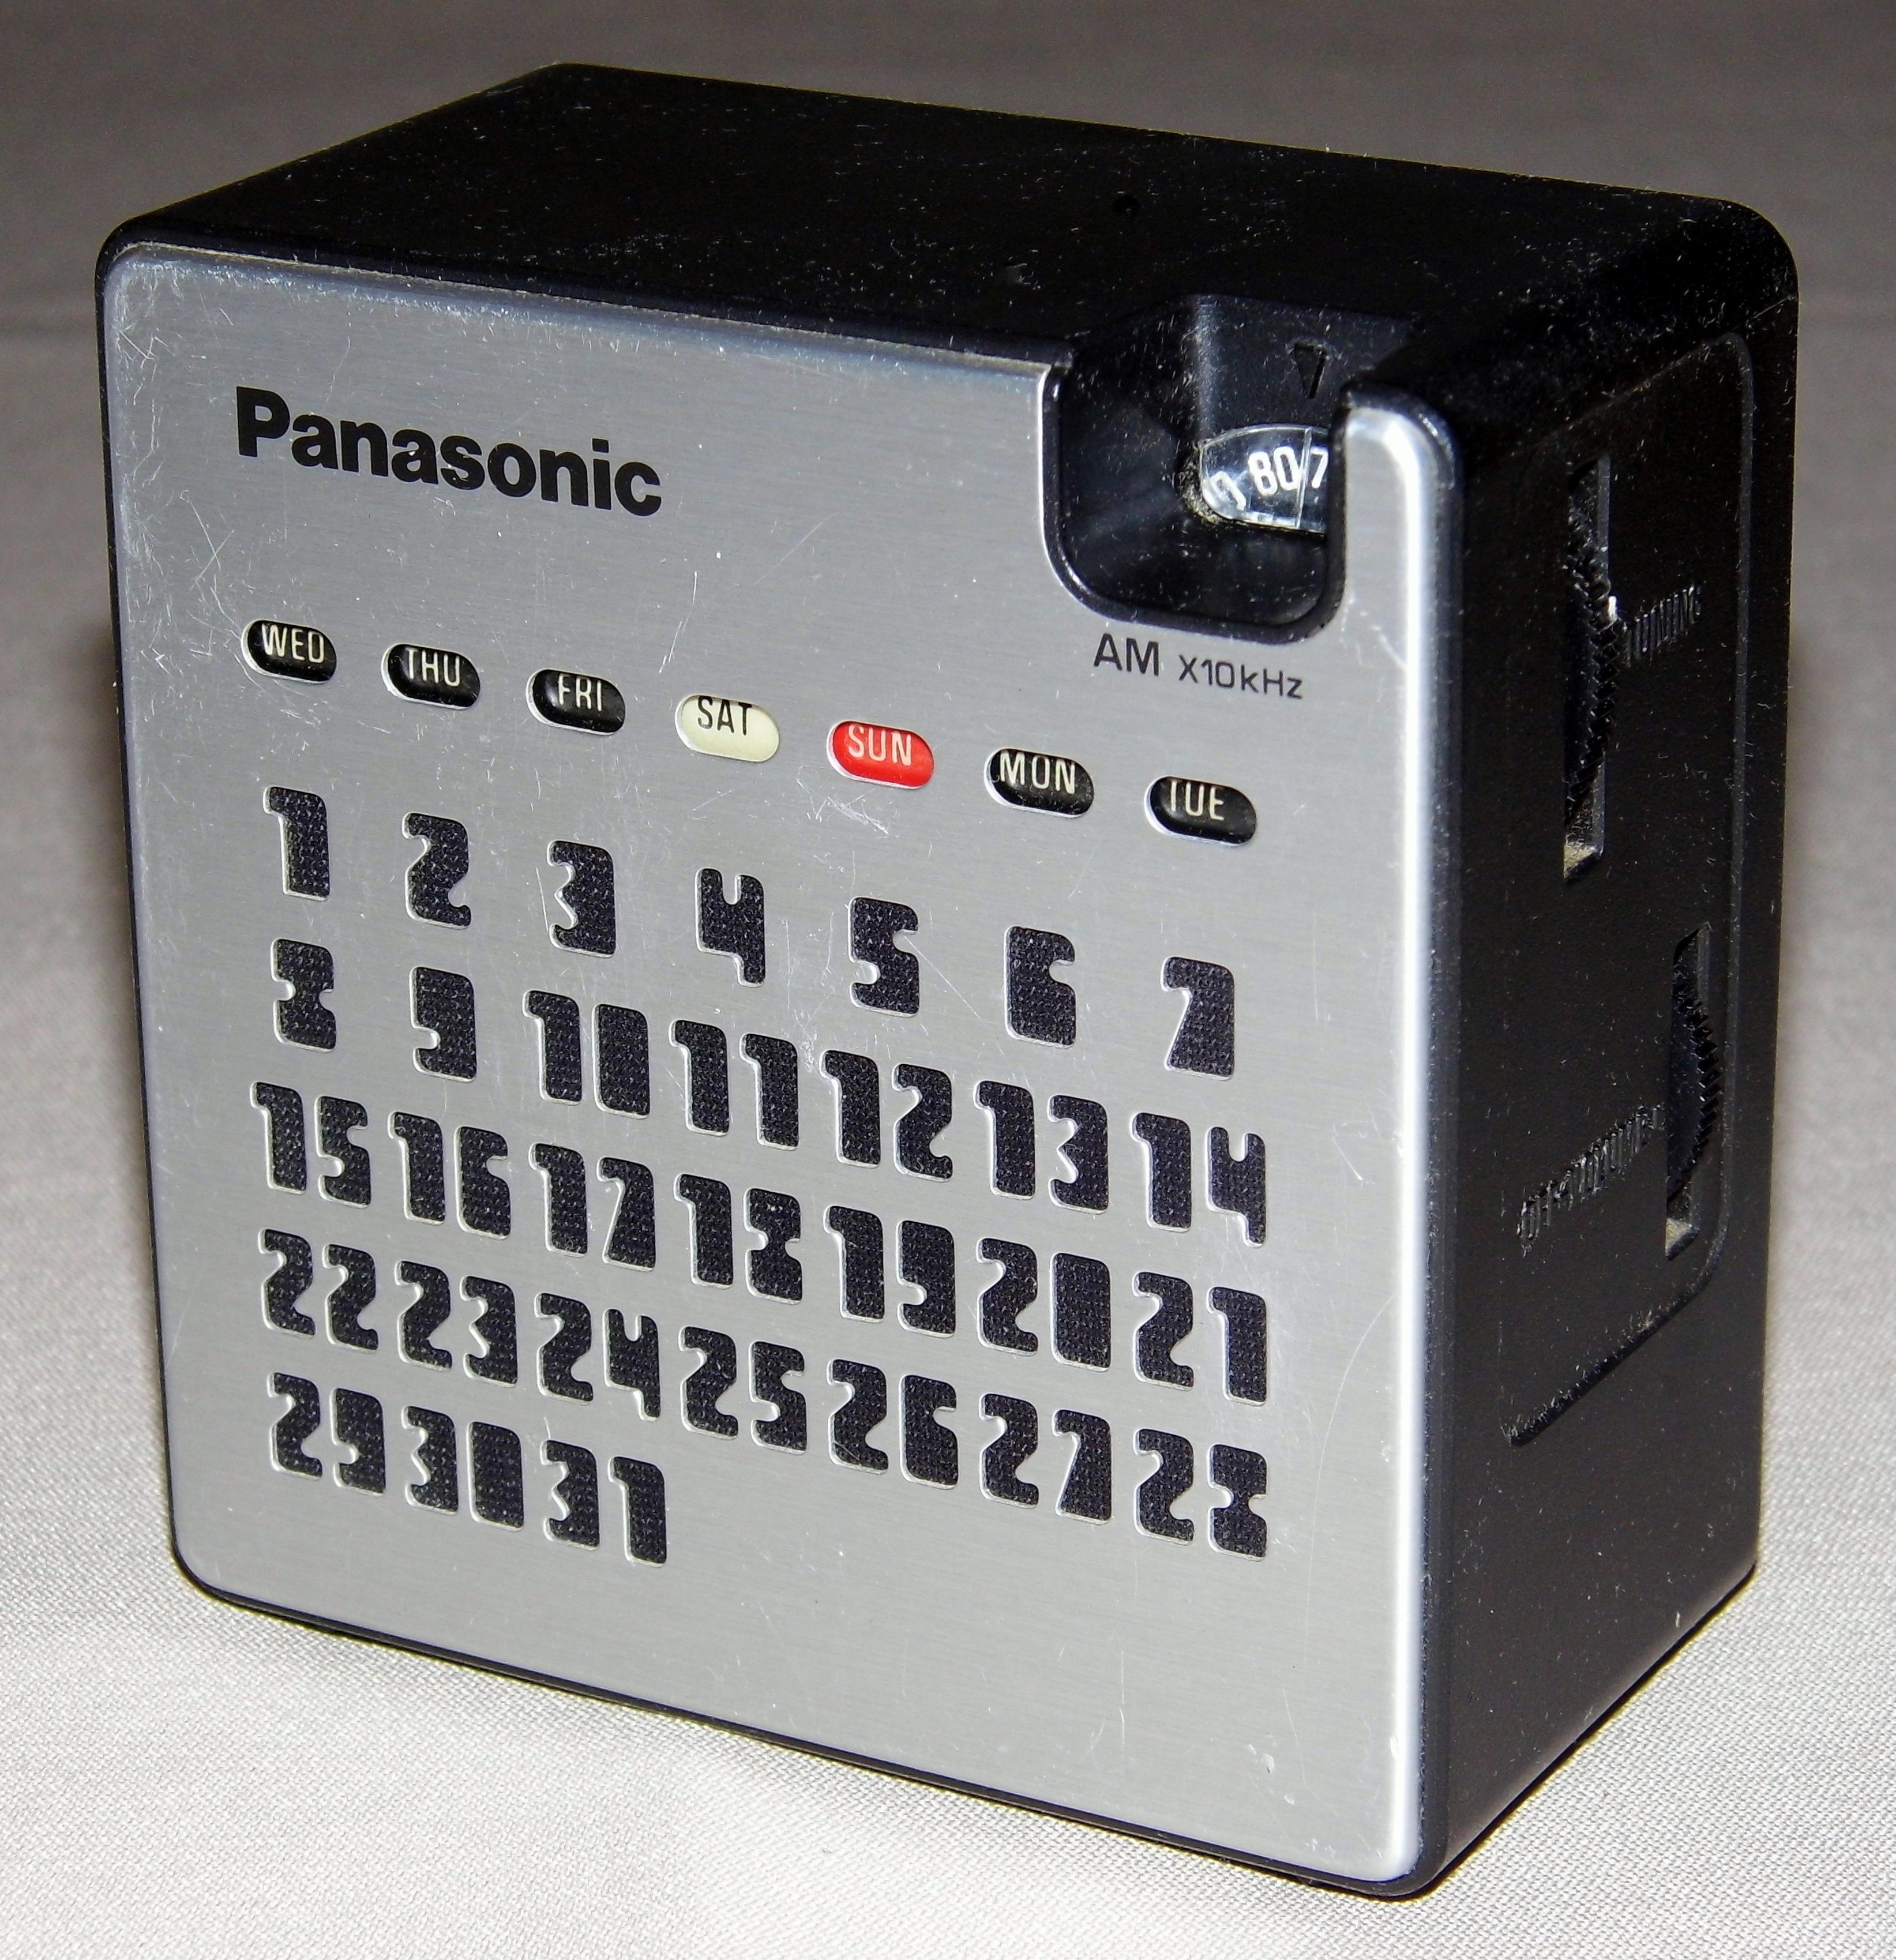 That interfere, vintage panasonic electronics